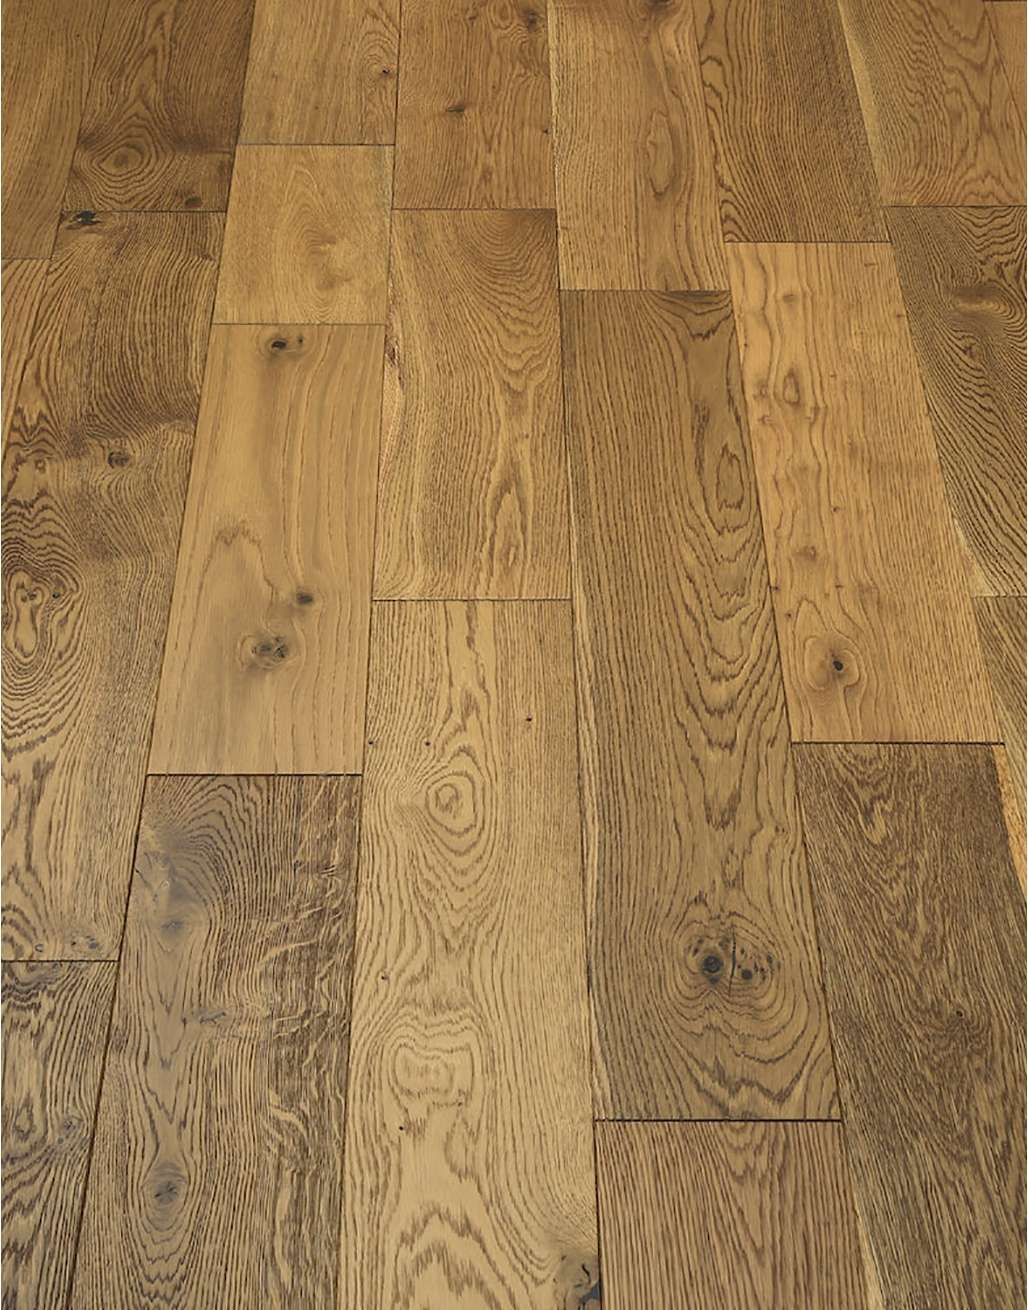 Manor Golden Smoked Oak Brushed & Lacquered Engineered Wood Flooring